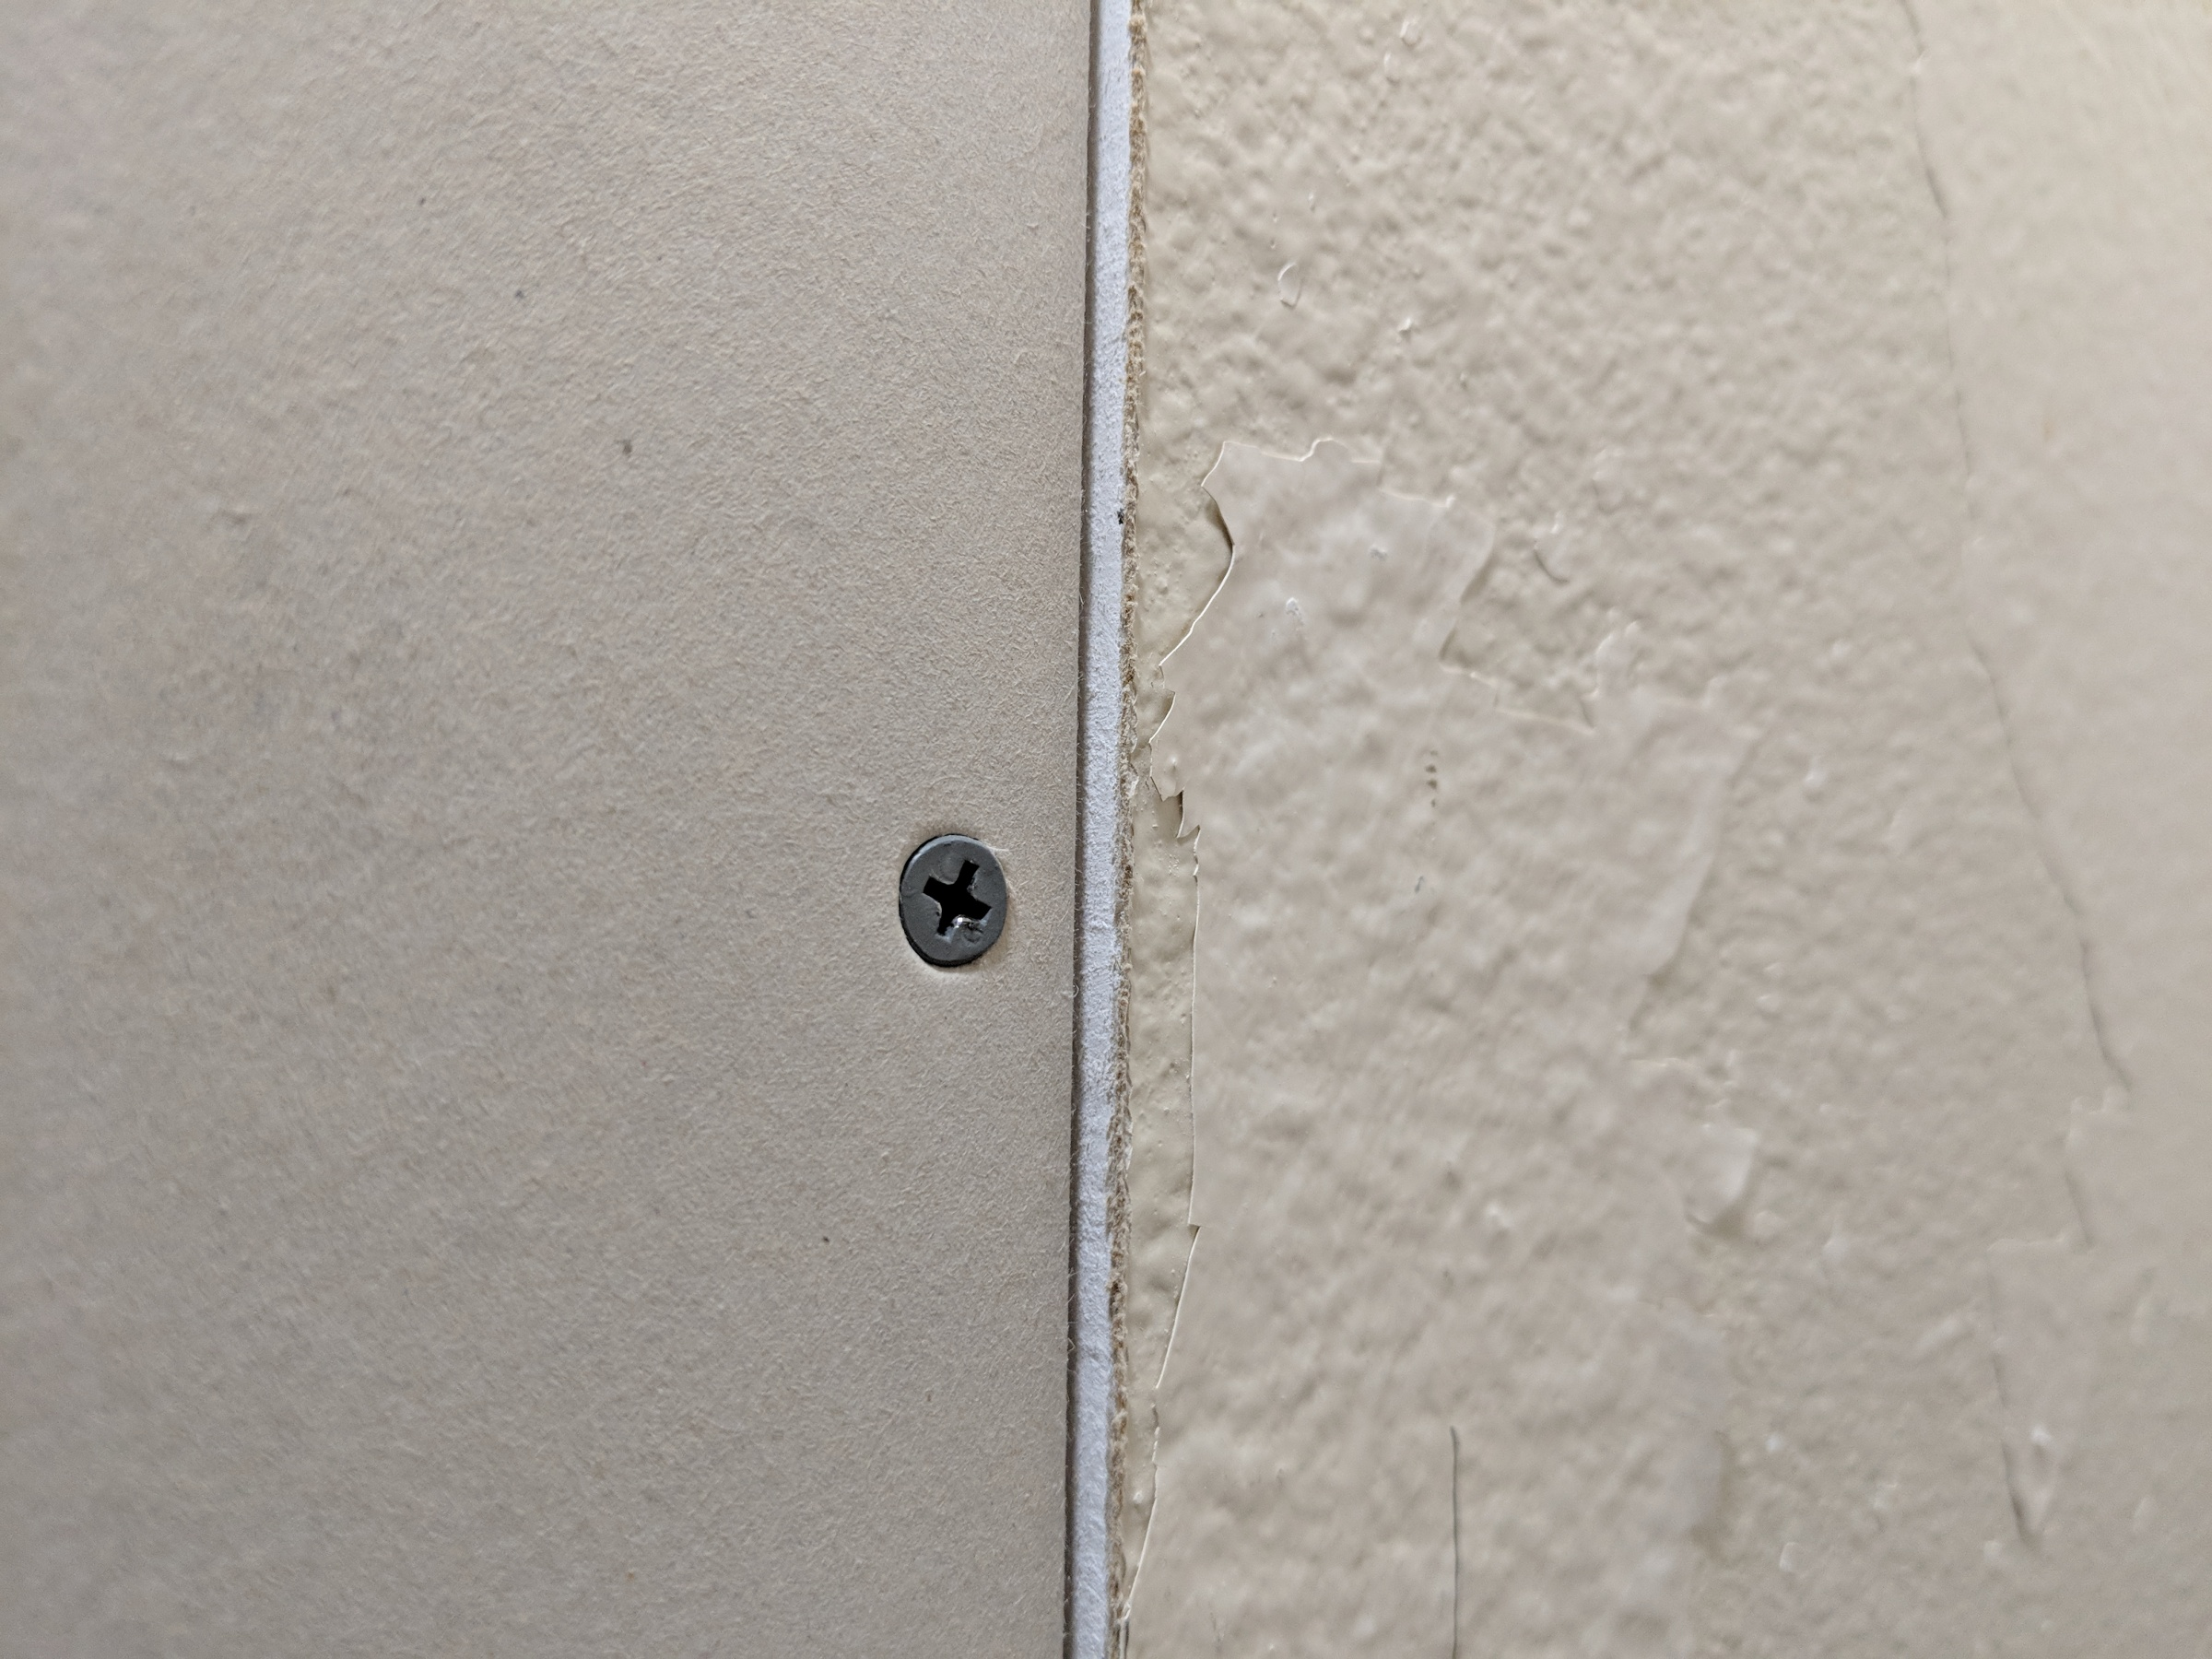 Remodeling Bathroom: Old Drywall Thicker Than New Drywall Dilemma-web1.jpg